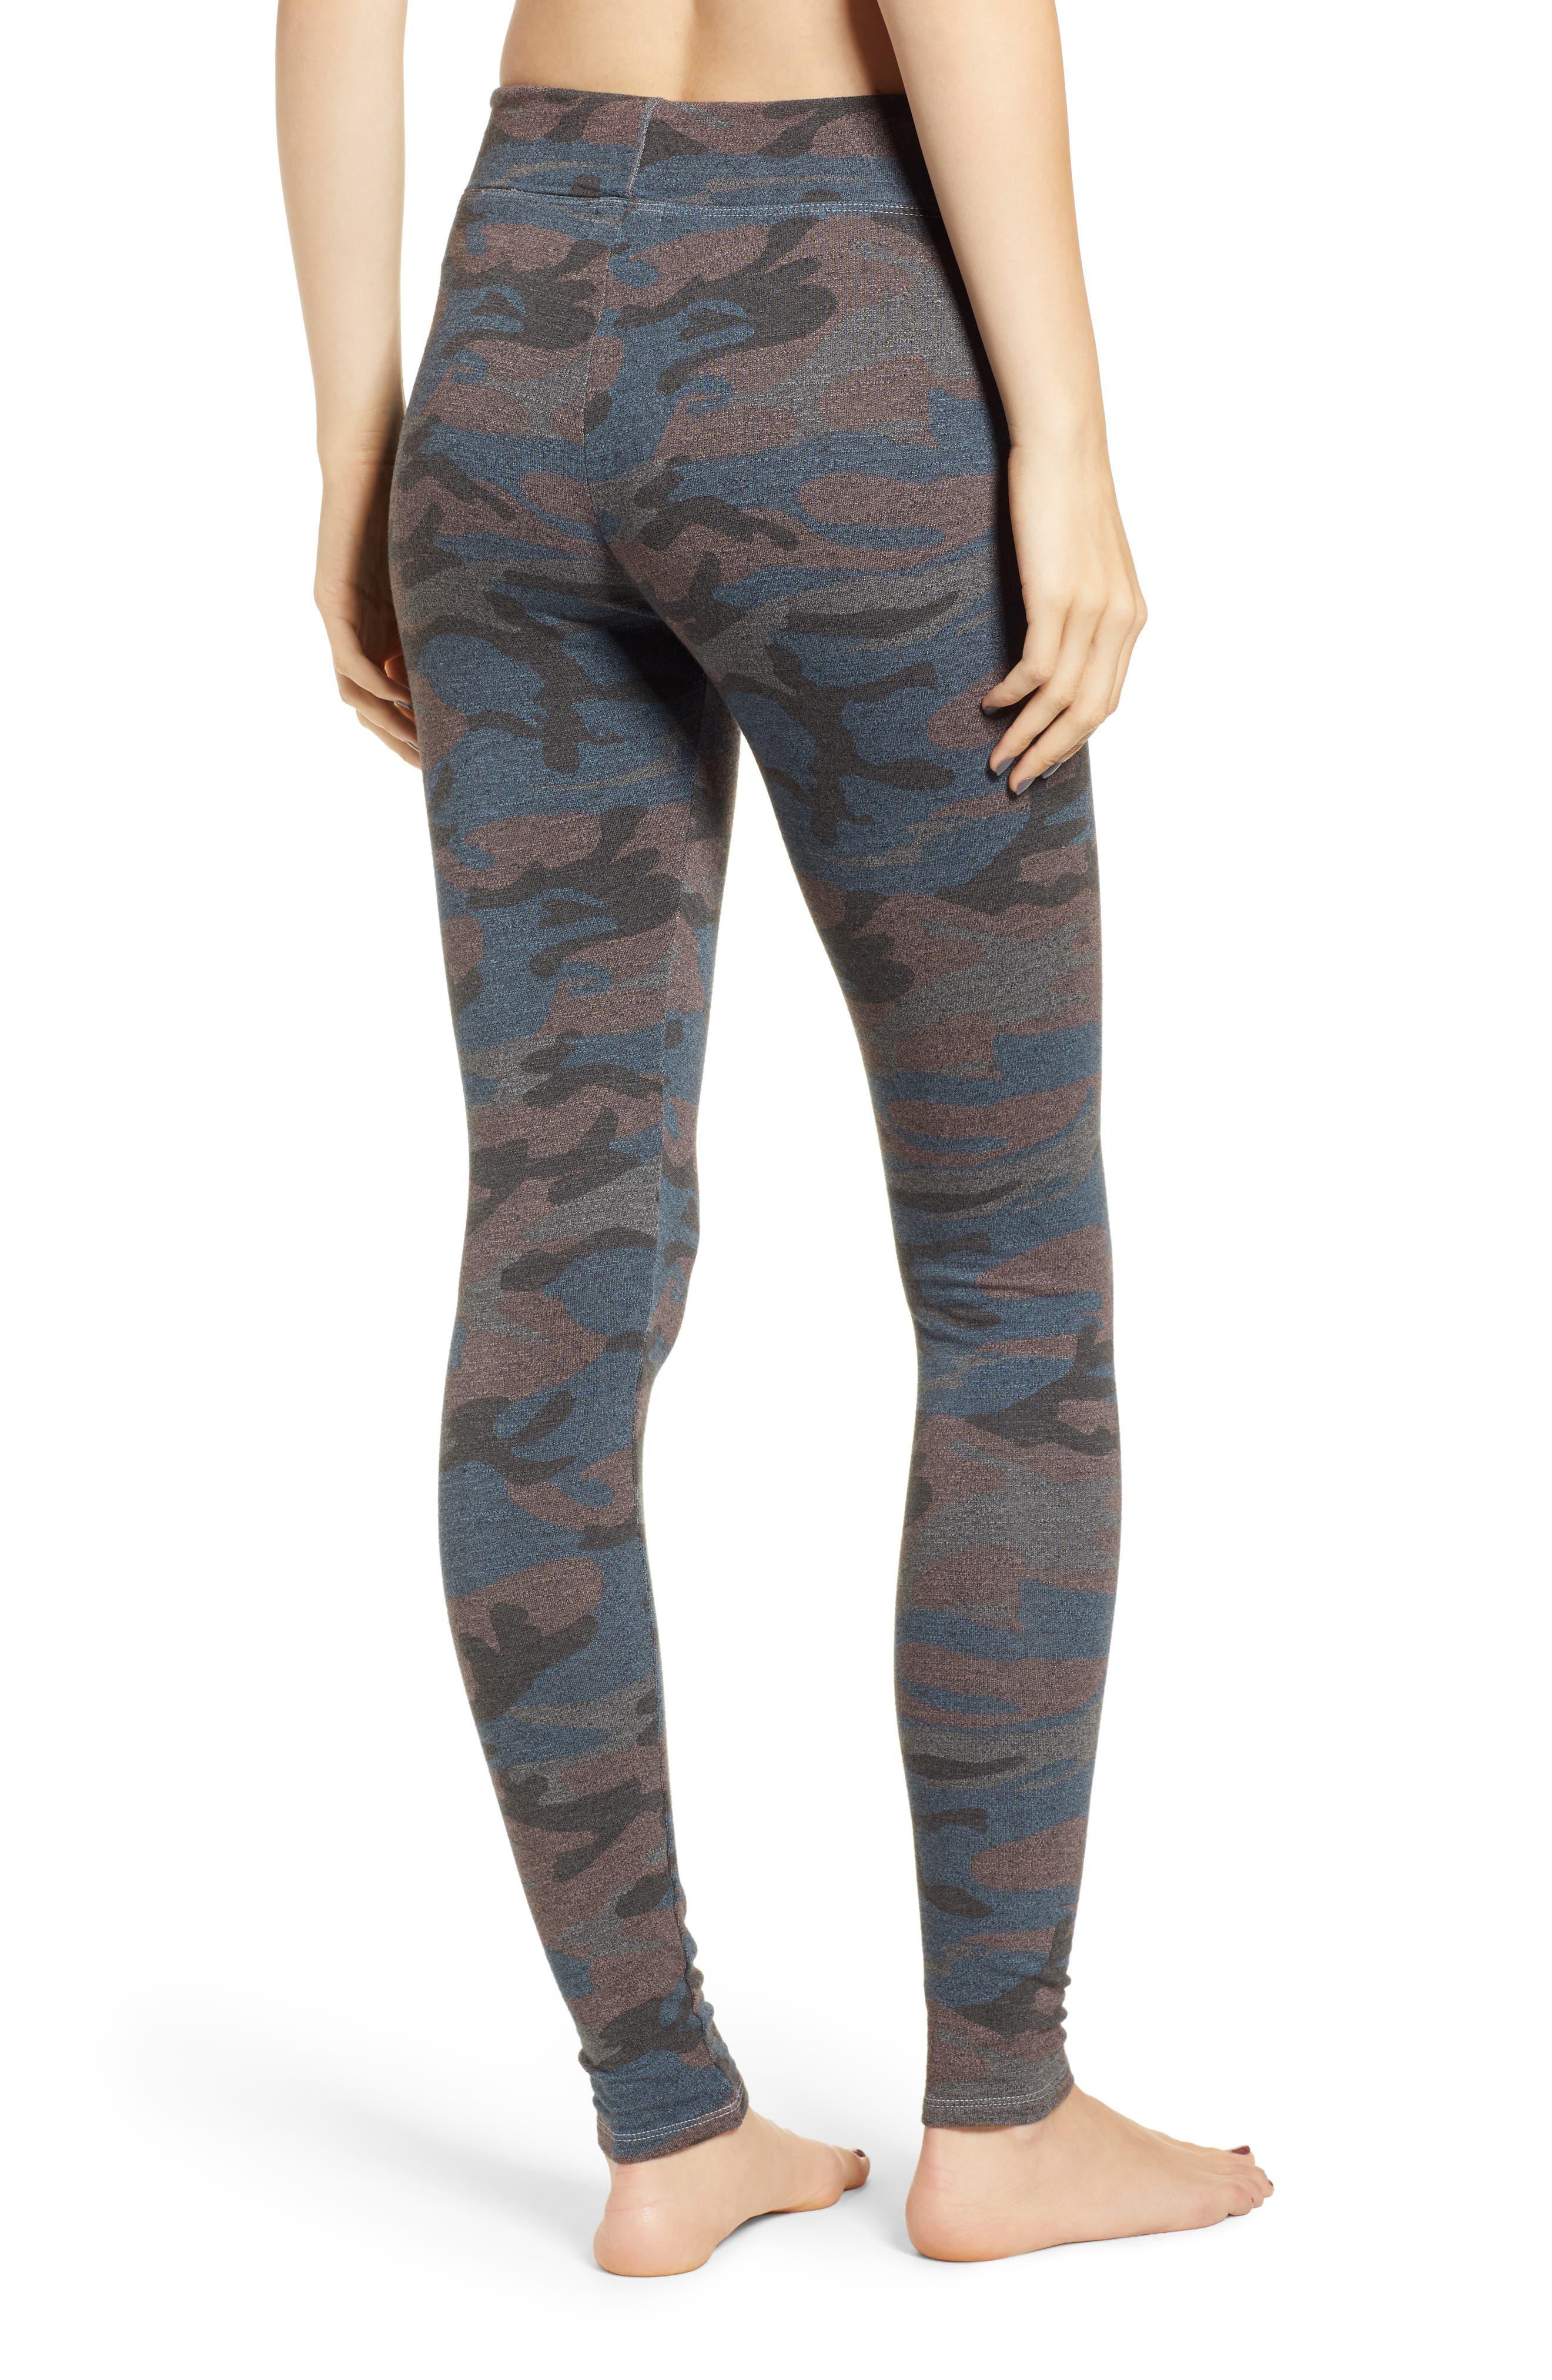 SUNDRY,                             Camo Yoga Pants,                             Alternate thumbnail 2, color,                             020